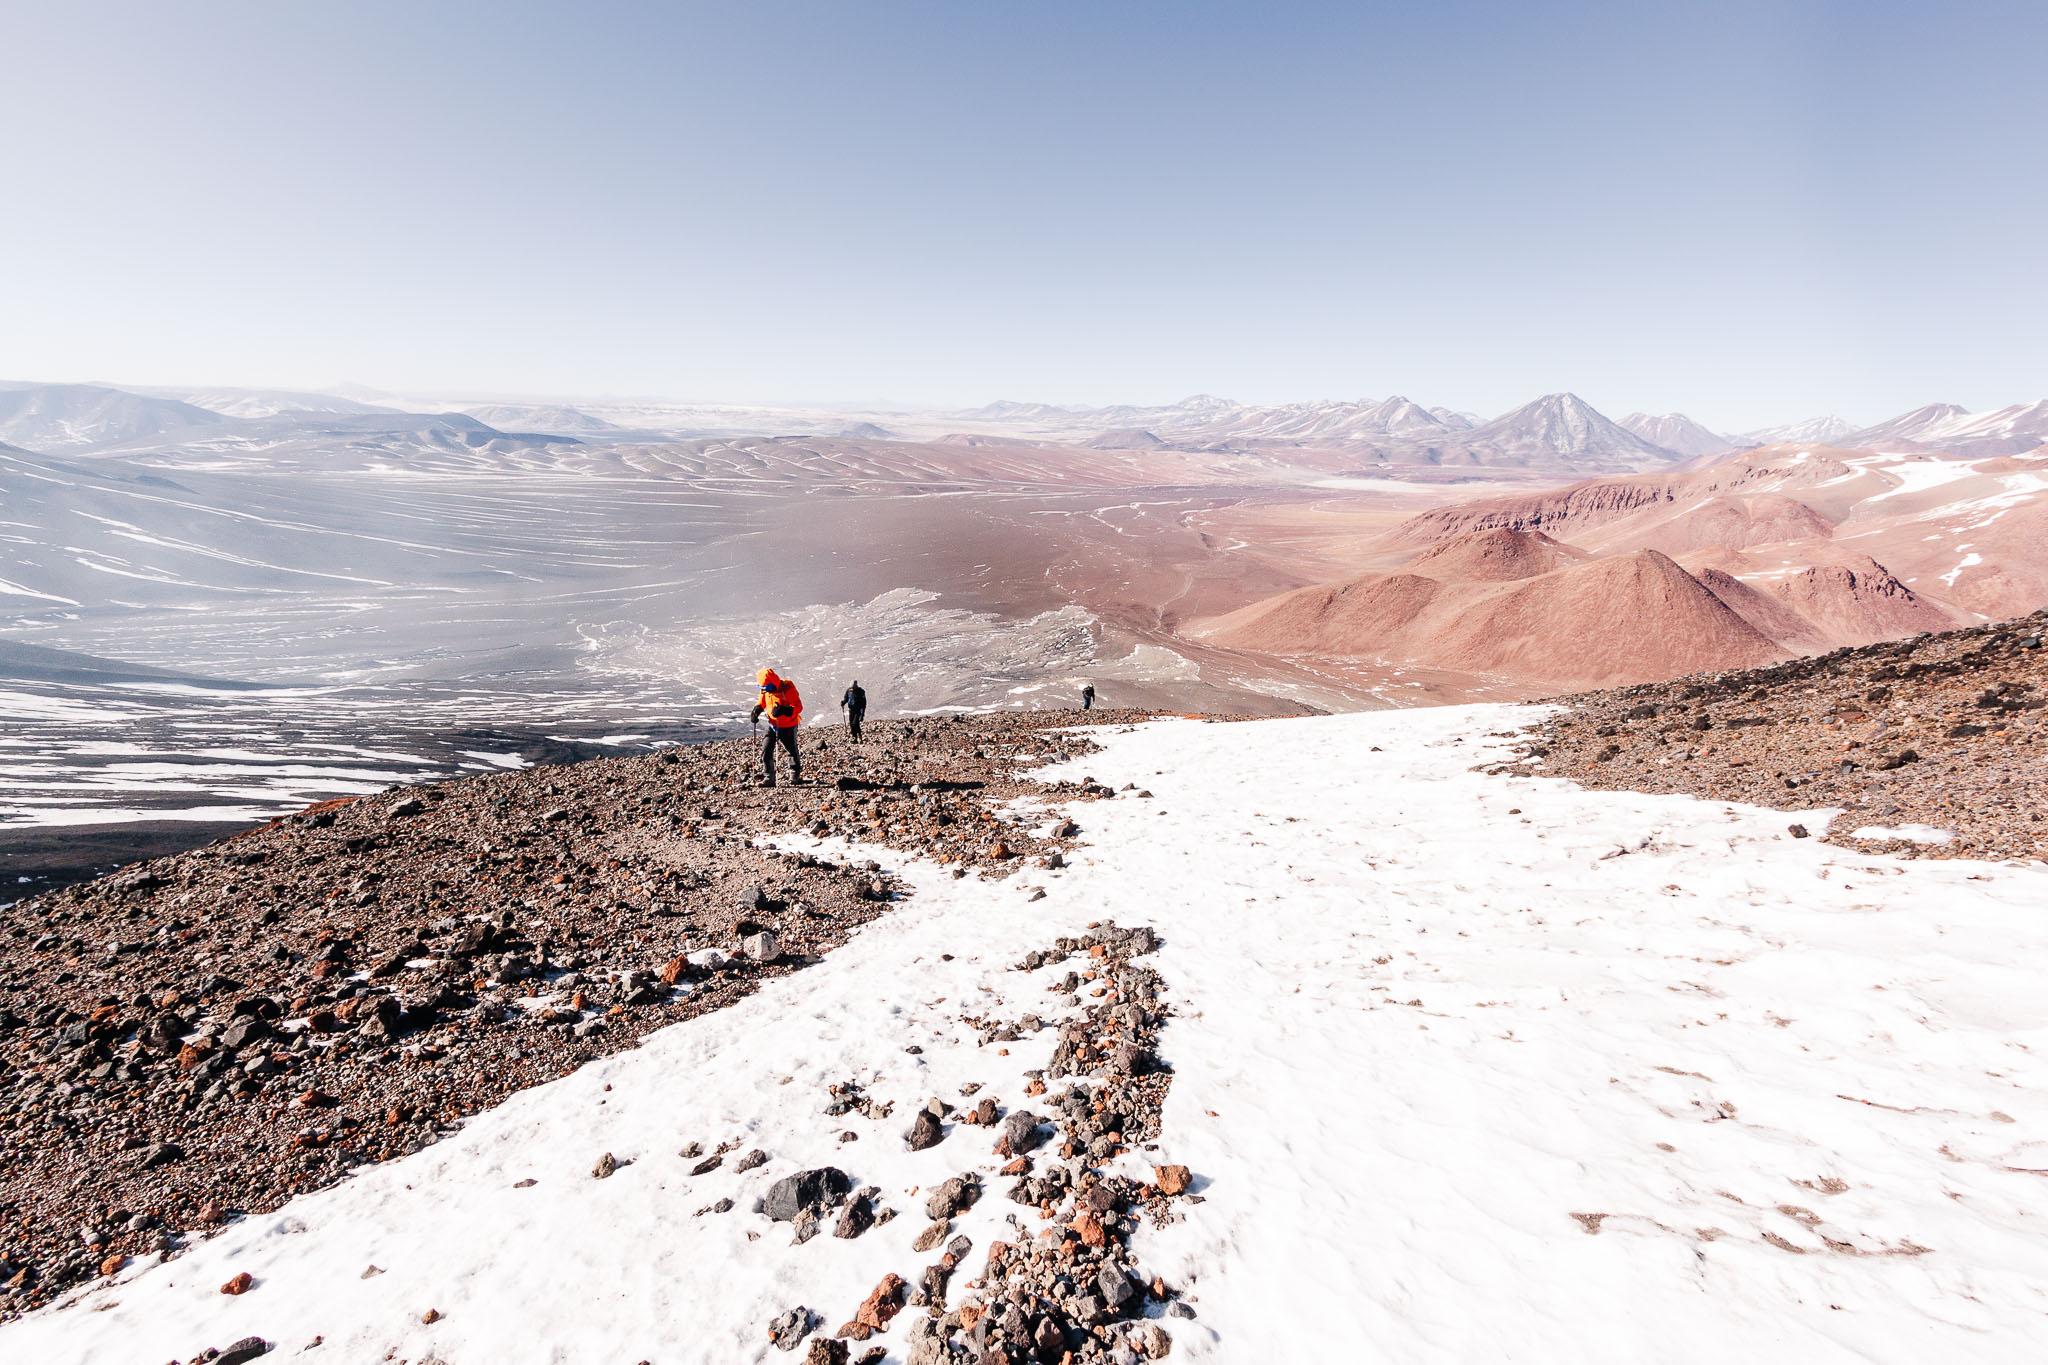 Auf dem Weg zum Vulkan Láscar (5600m).